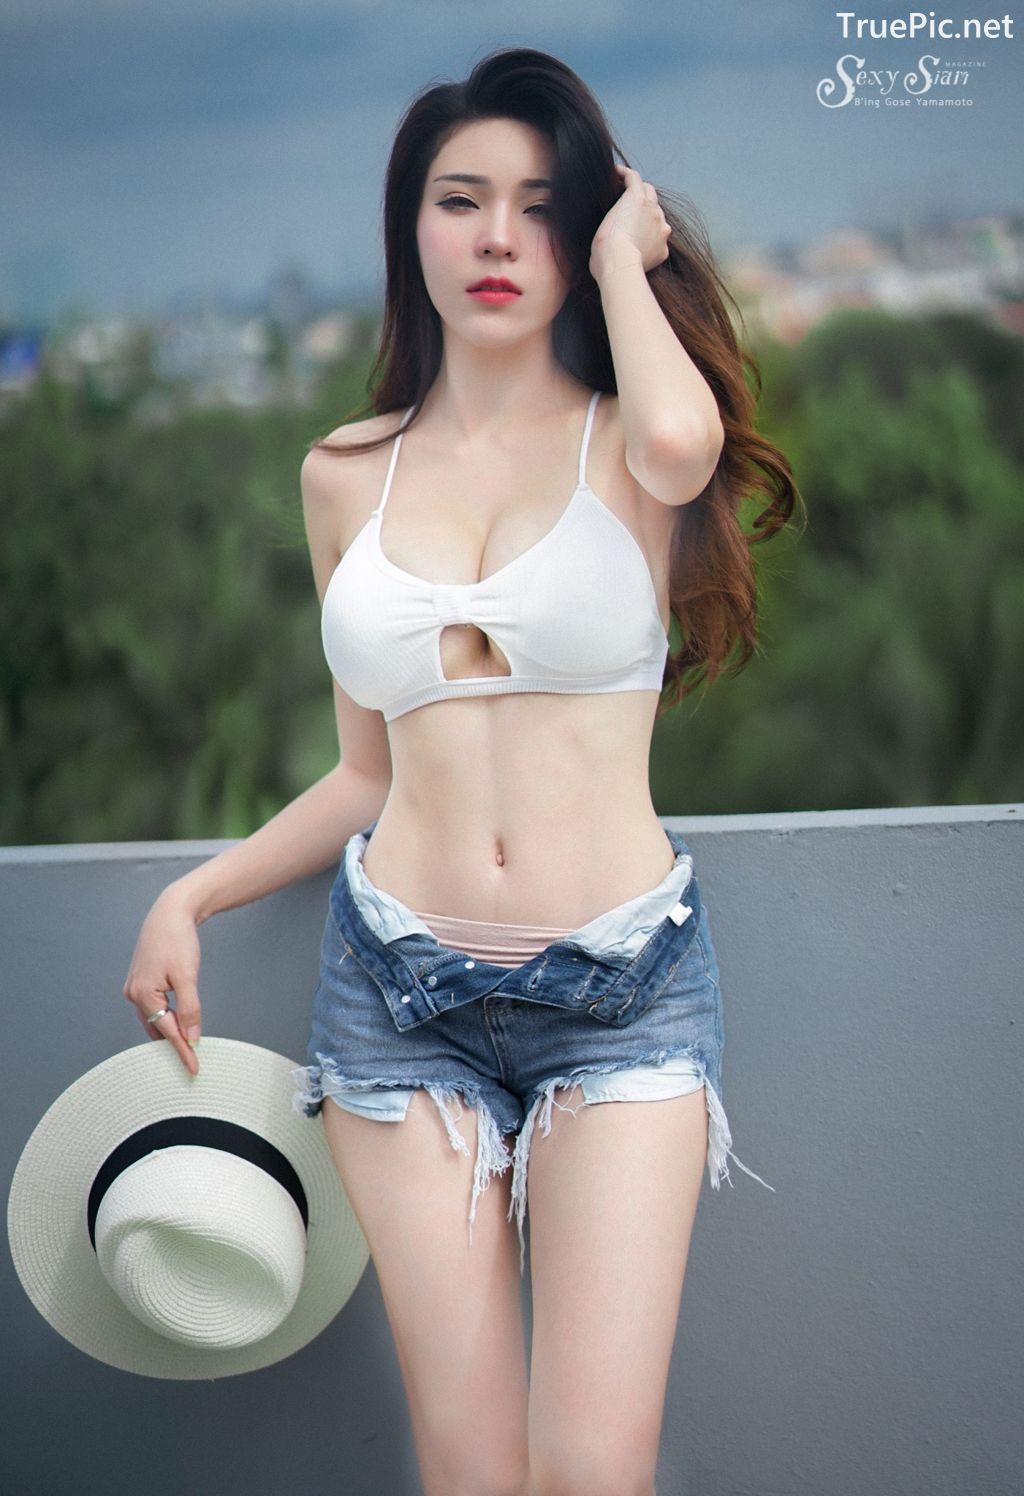 Image-Thailand Sexy Model-Janet-Kanokwan-Saesim-White-Bra-And-Jean-TruePic.net- Picture-10